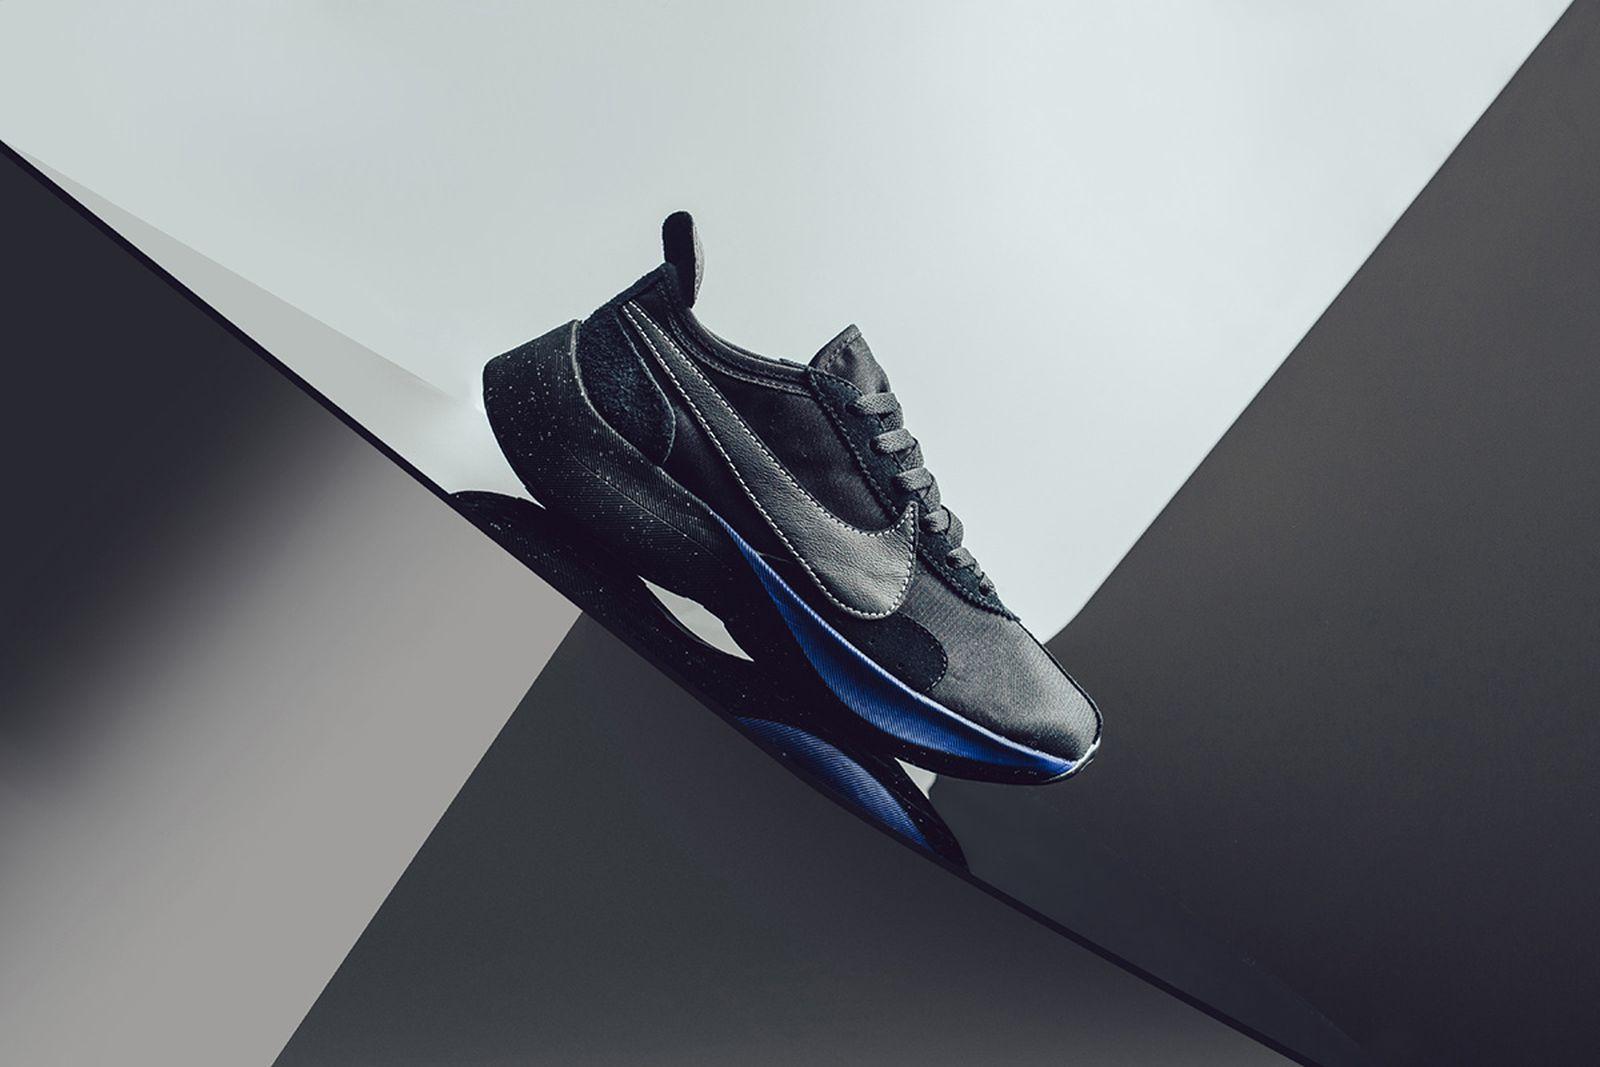 nike moon racer black racer blue release date price